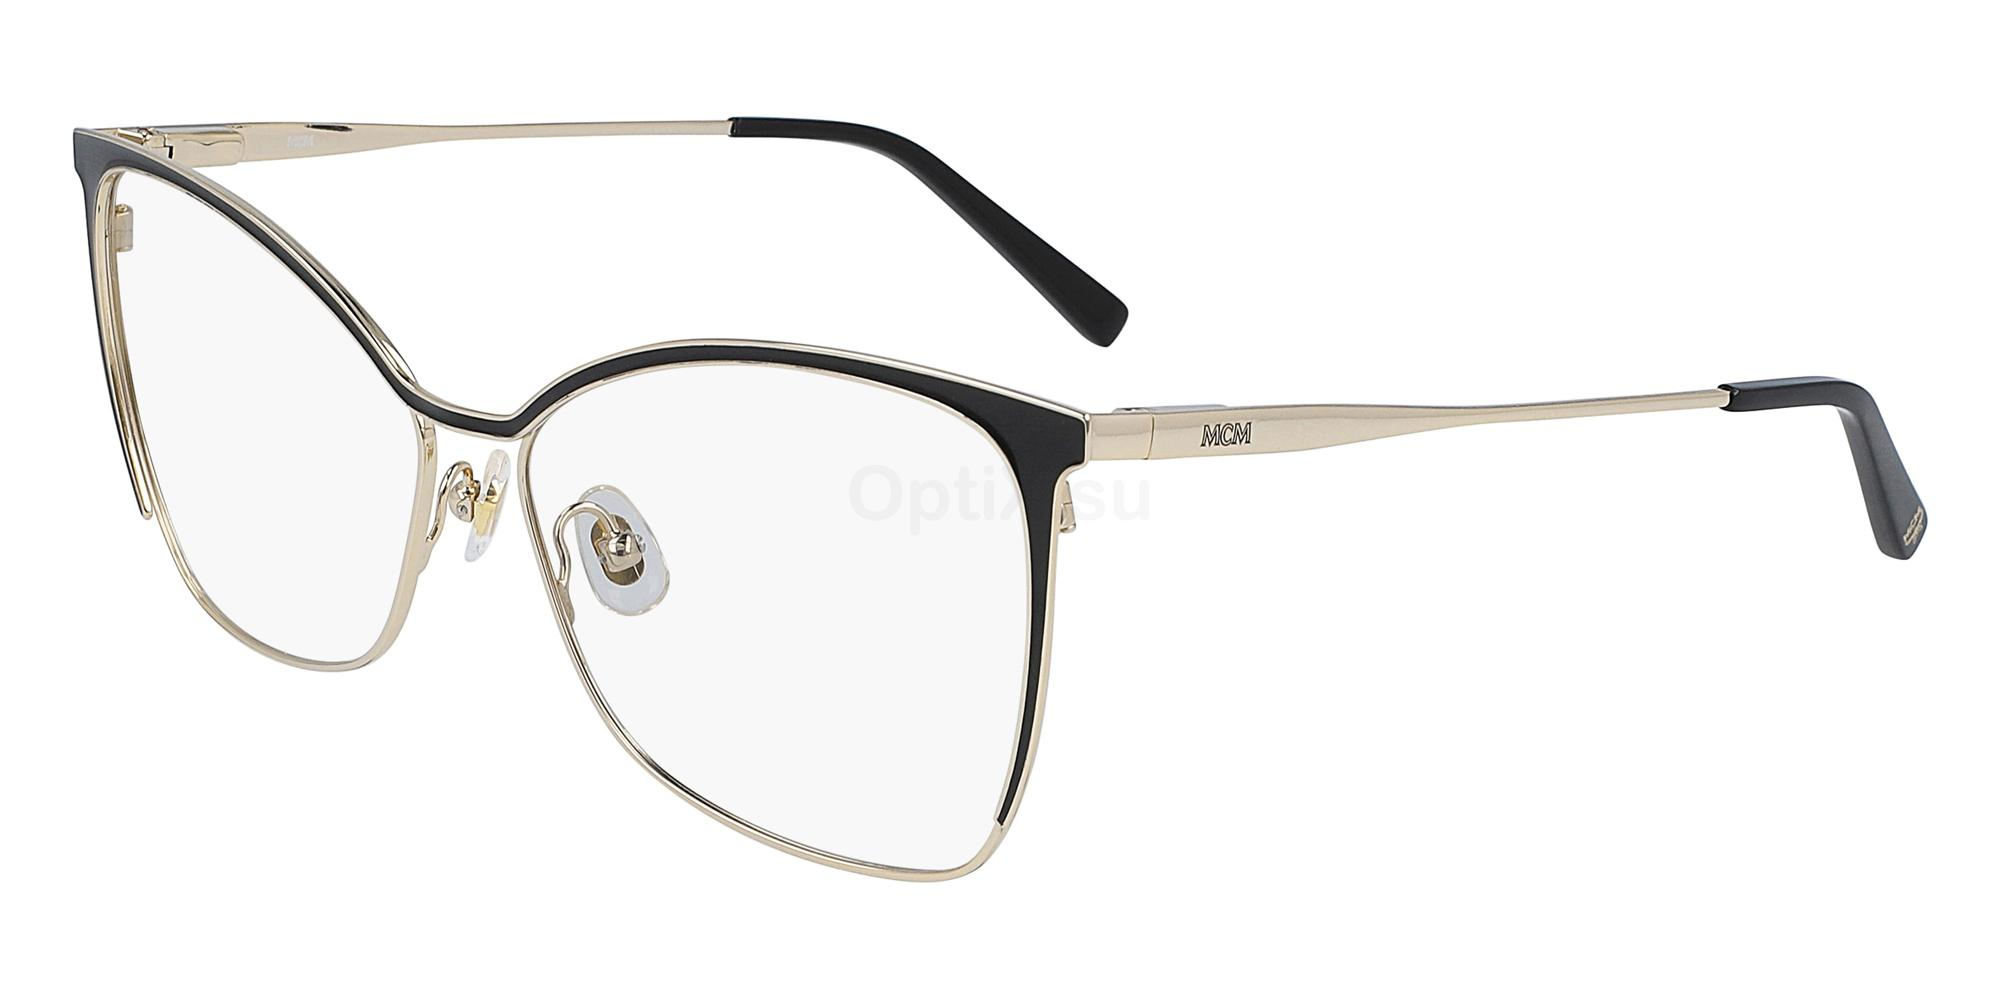 001 MCM2139 Glasses, MCM